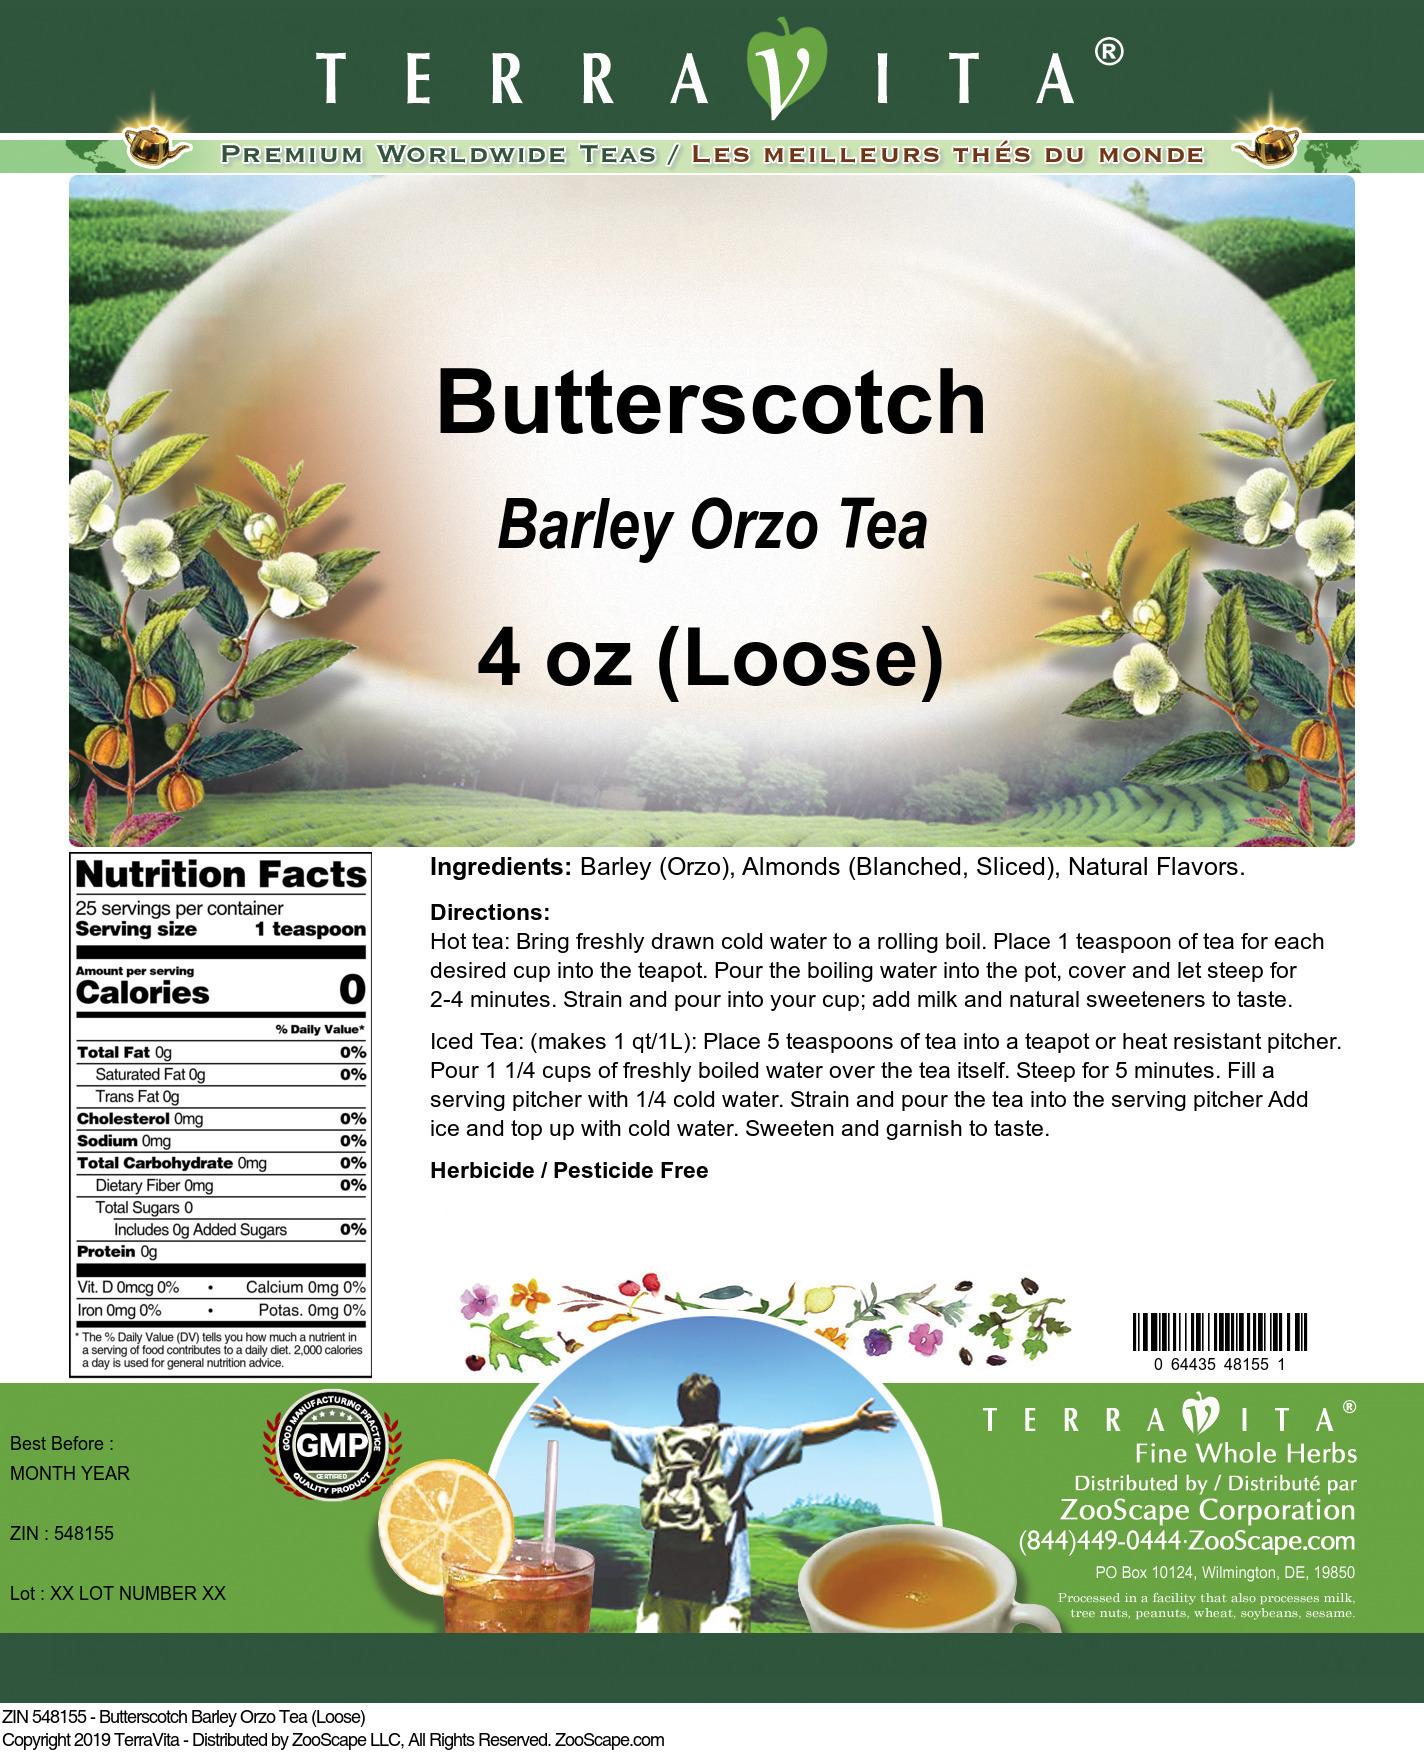 Butterscotch Barley Orzo Tea (Loose)